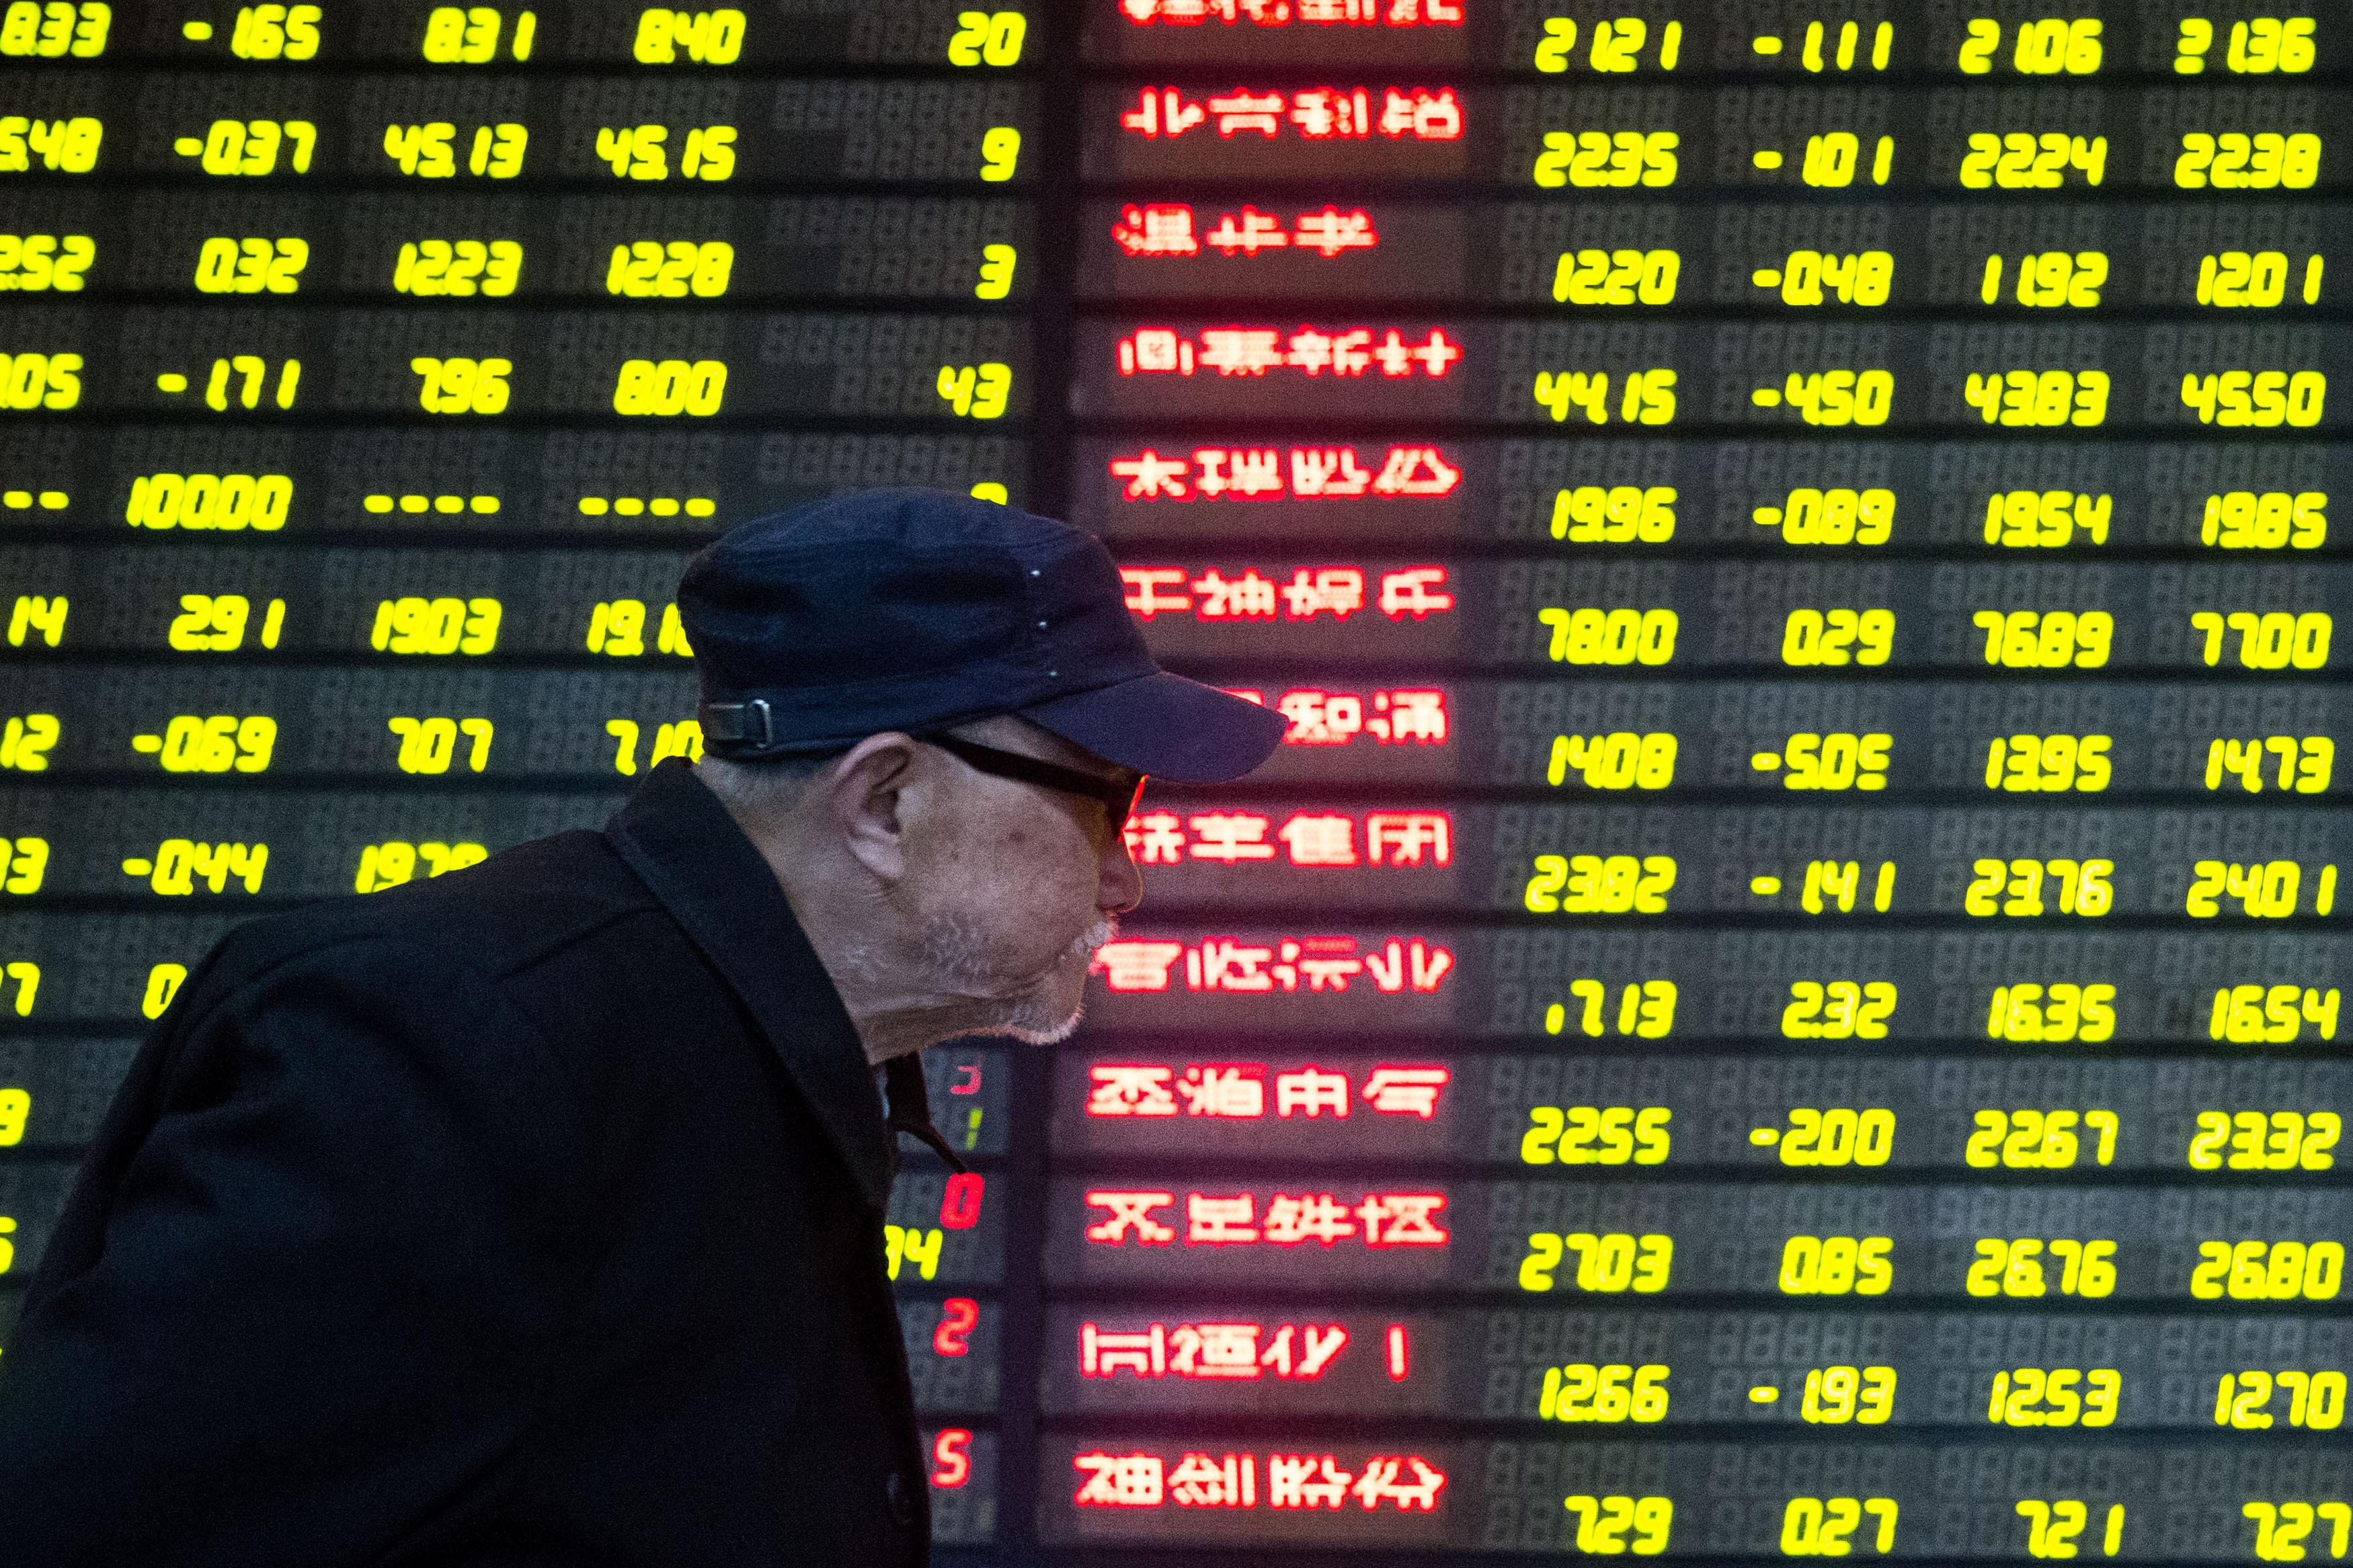 China Stocks Drops As Shenzhen-Hong Kong Stock Connect Launches